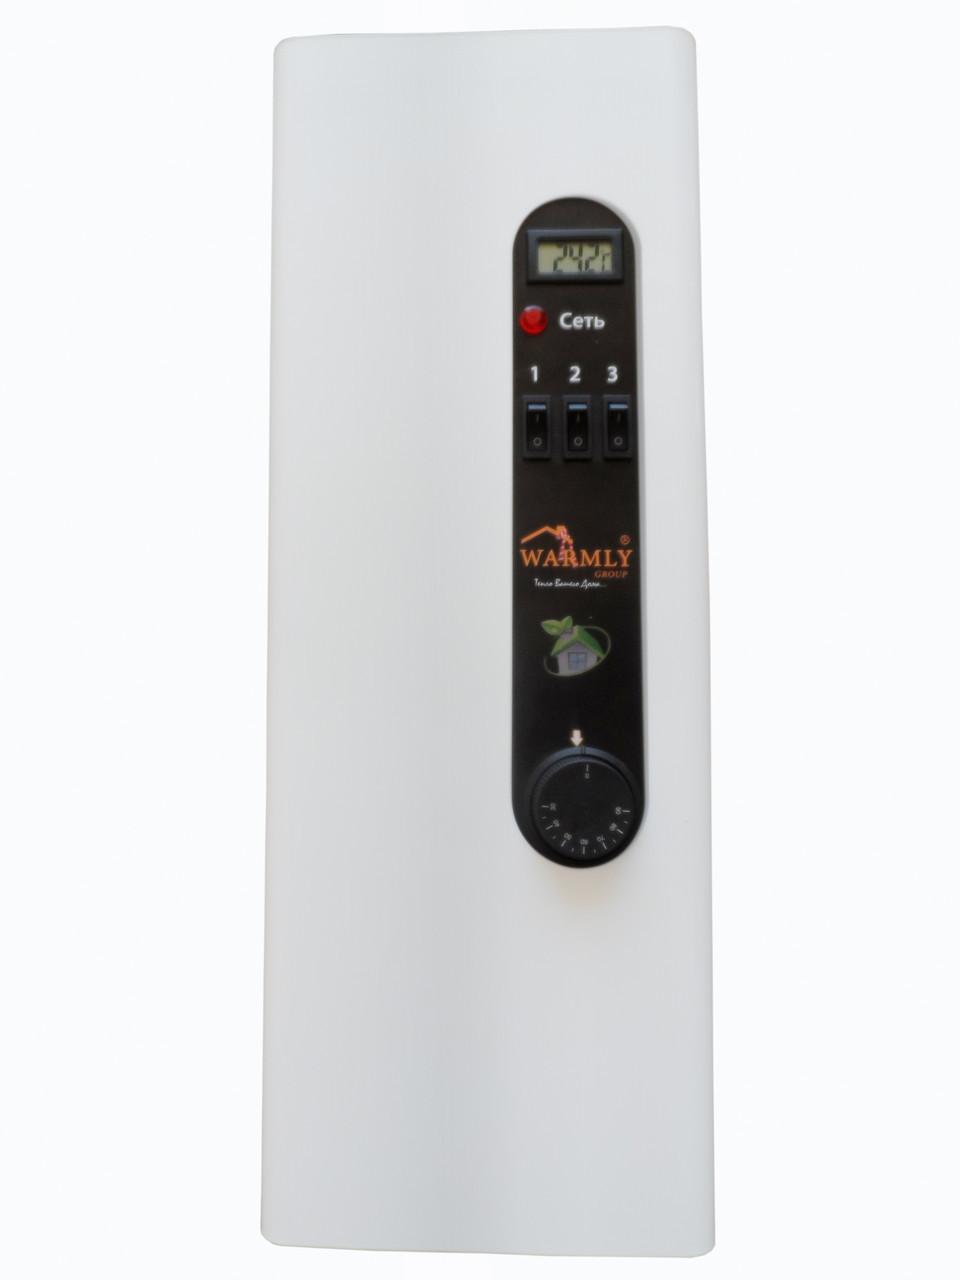 Котёл электрический Warmly Classik Series 3 кВт 220V